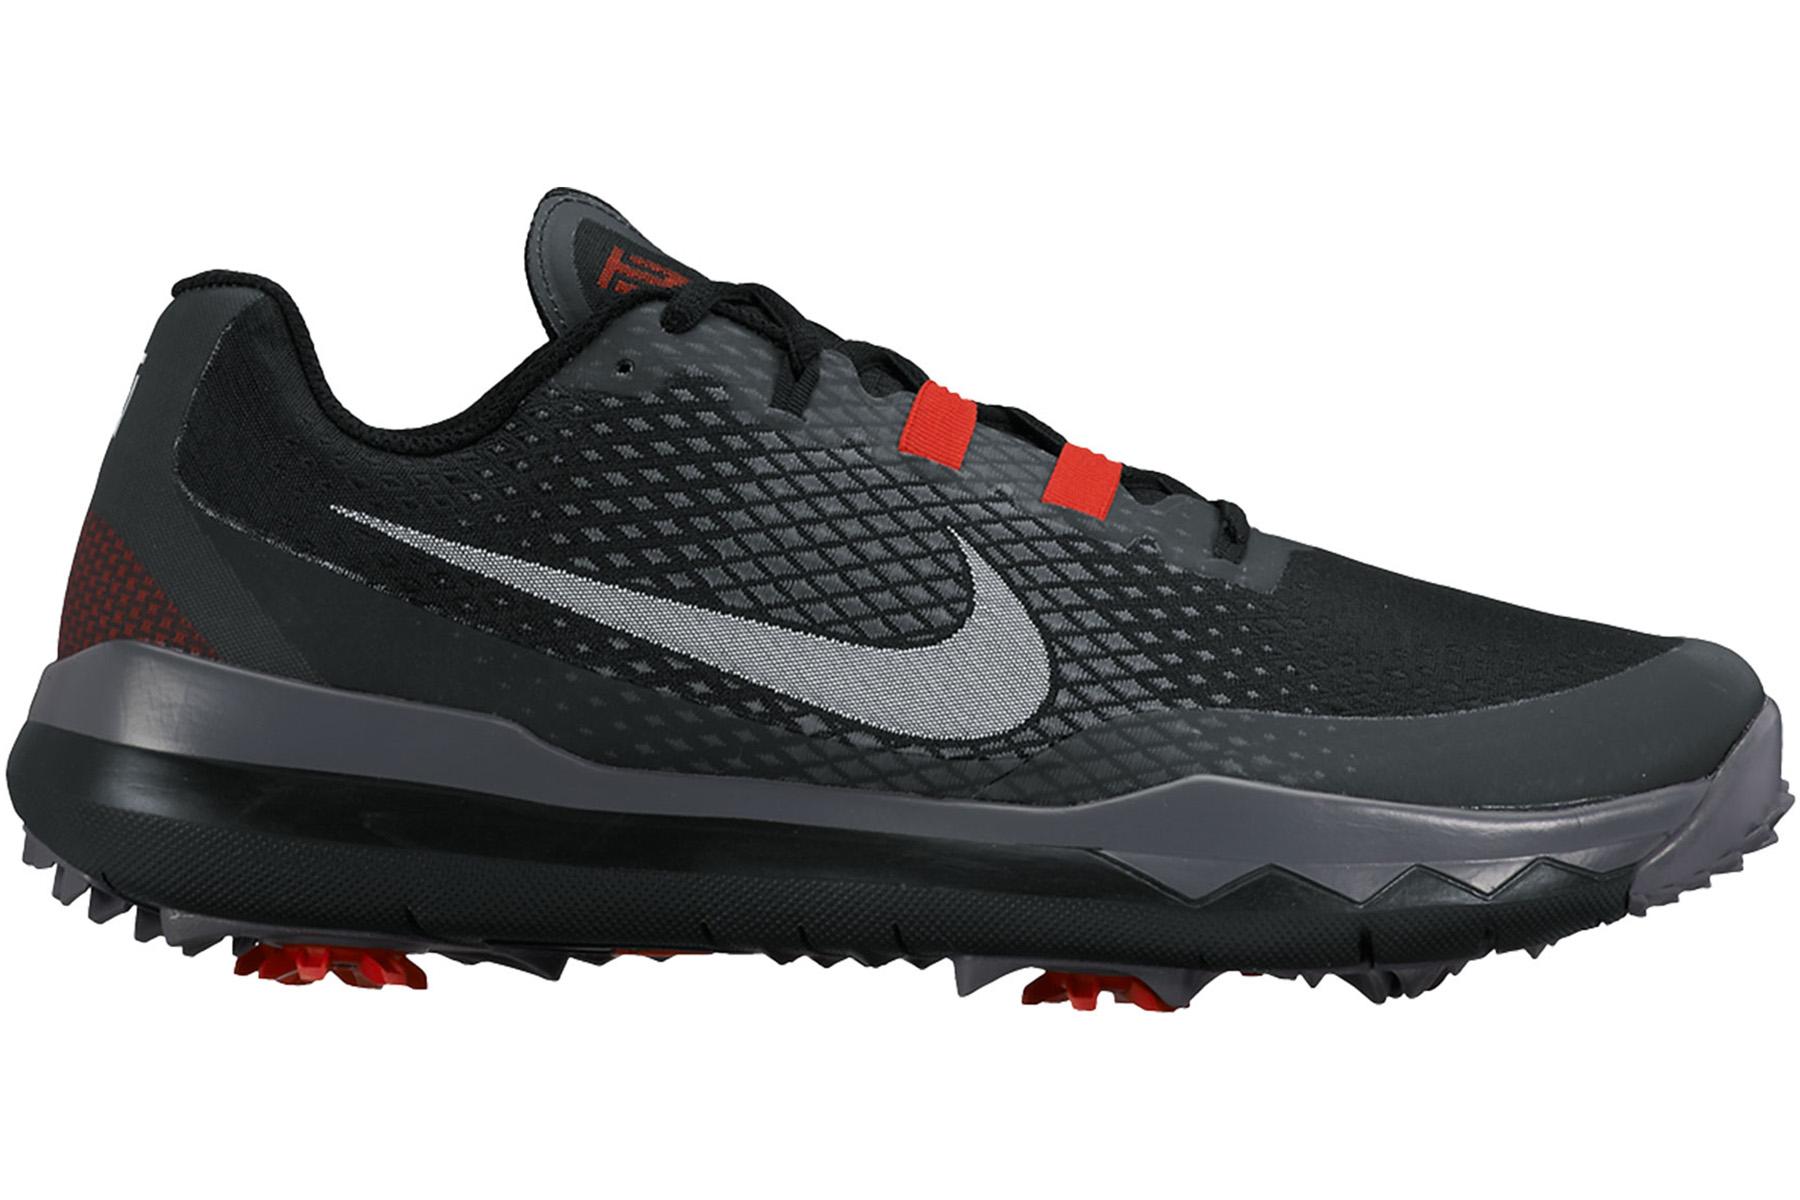 Nike Golf Tw 15 Shoes Online Golf